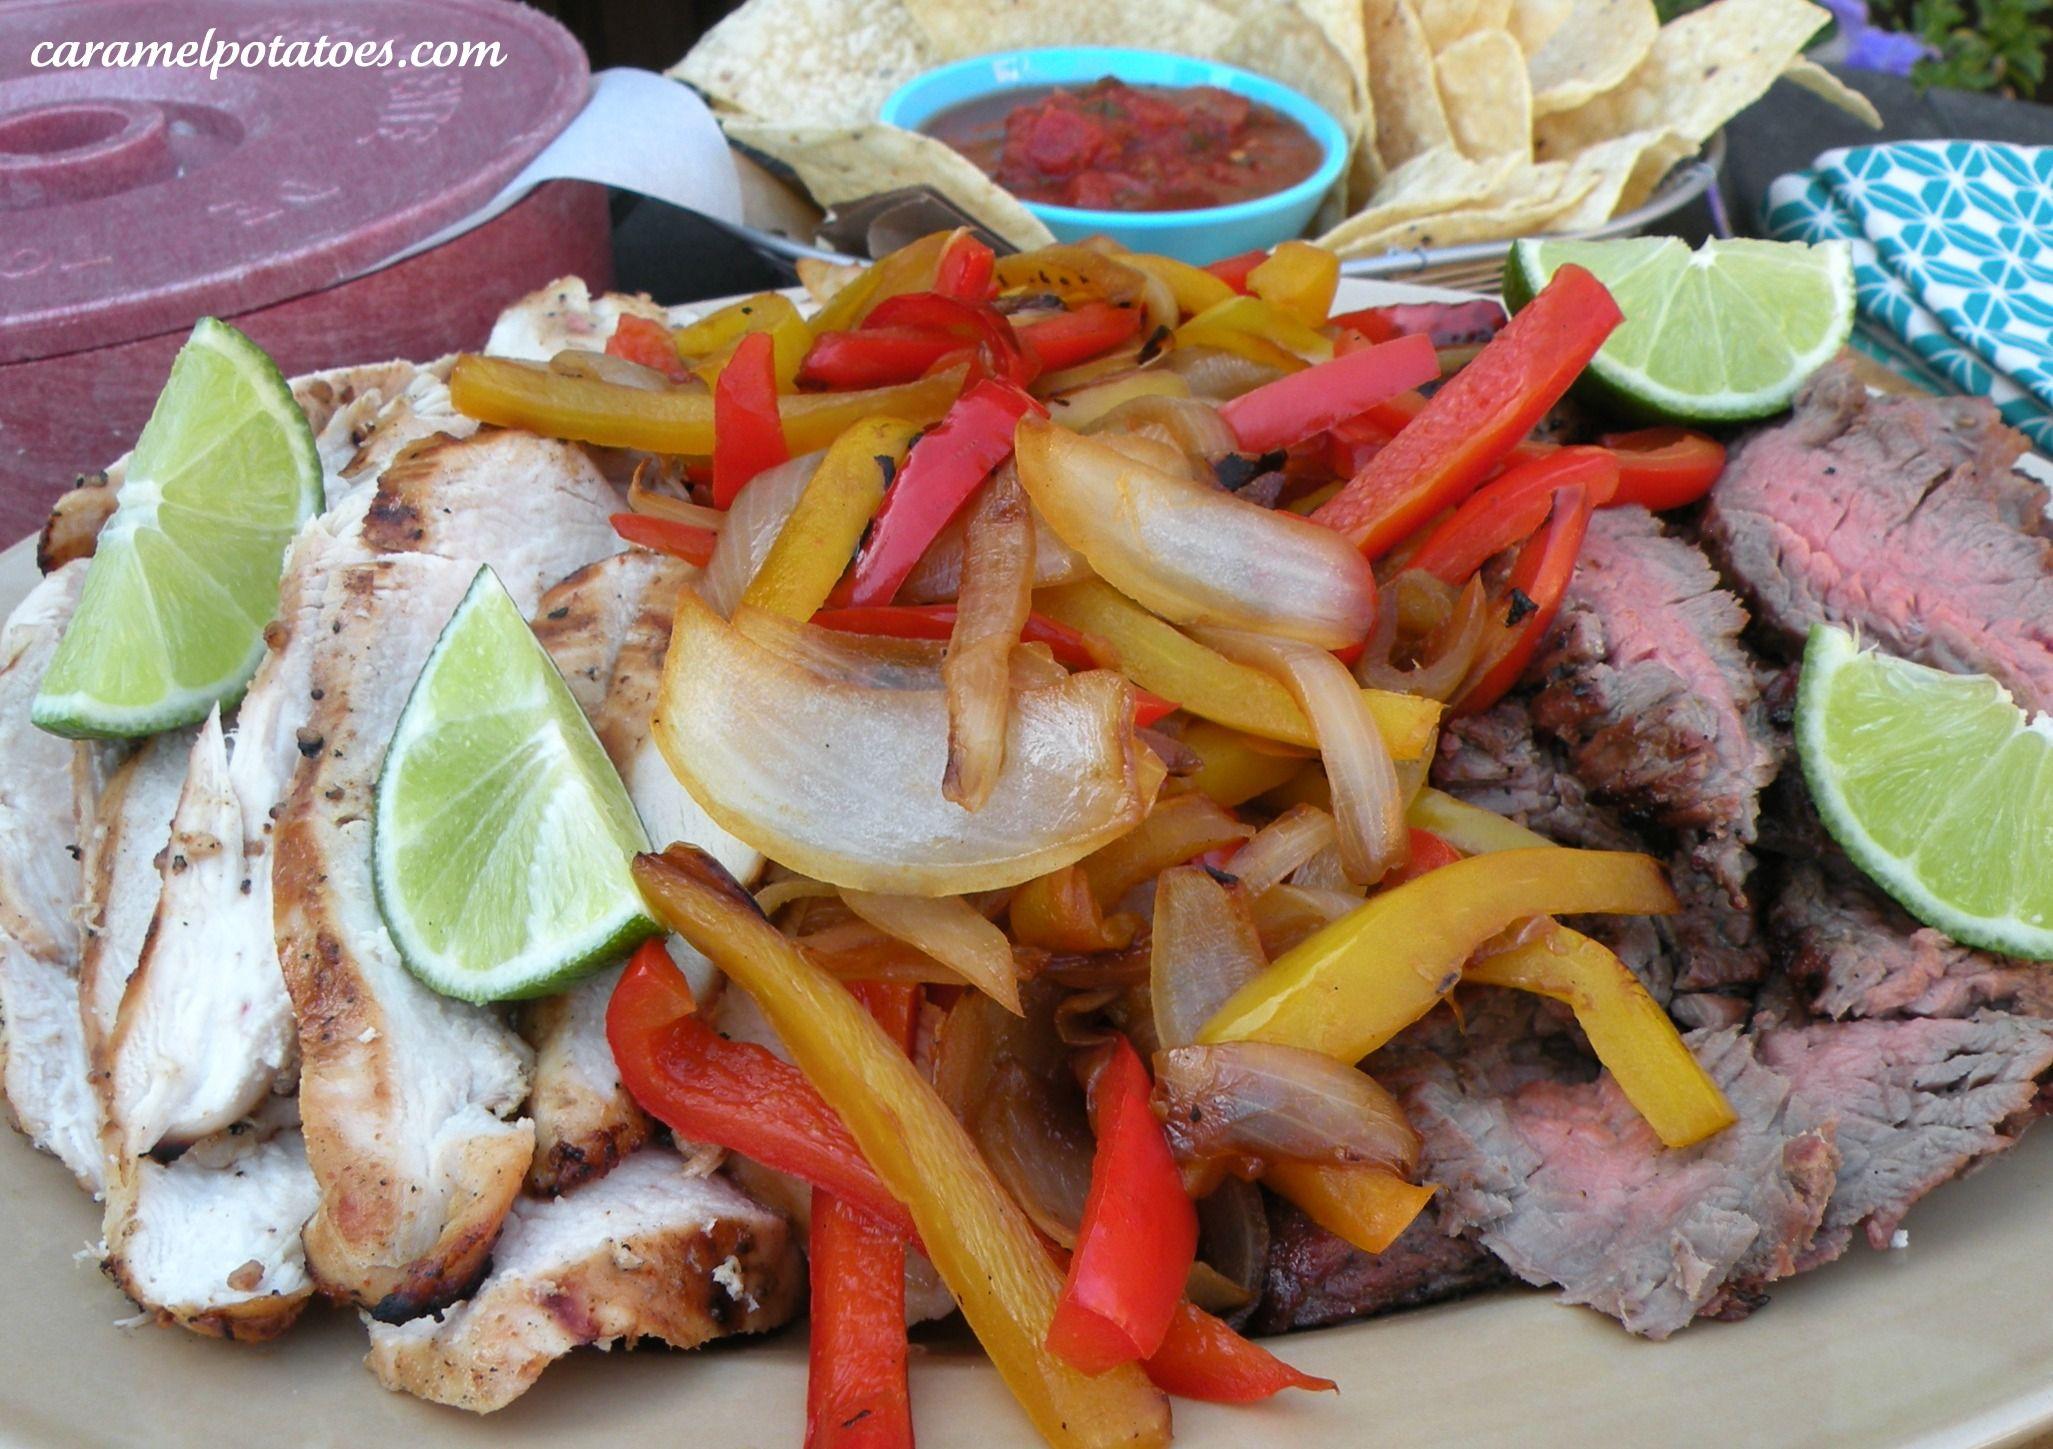 Fajita Marinade for Chicken or Steak